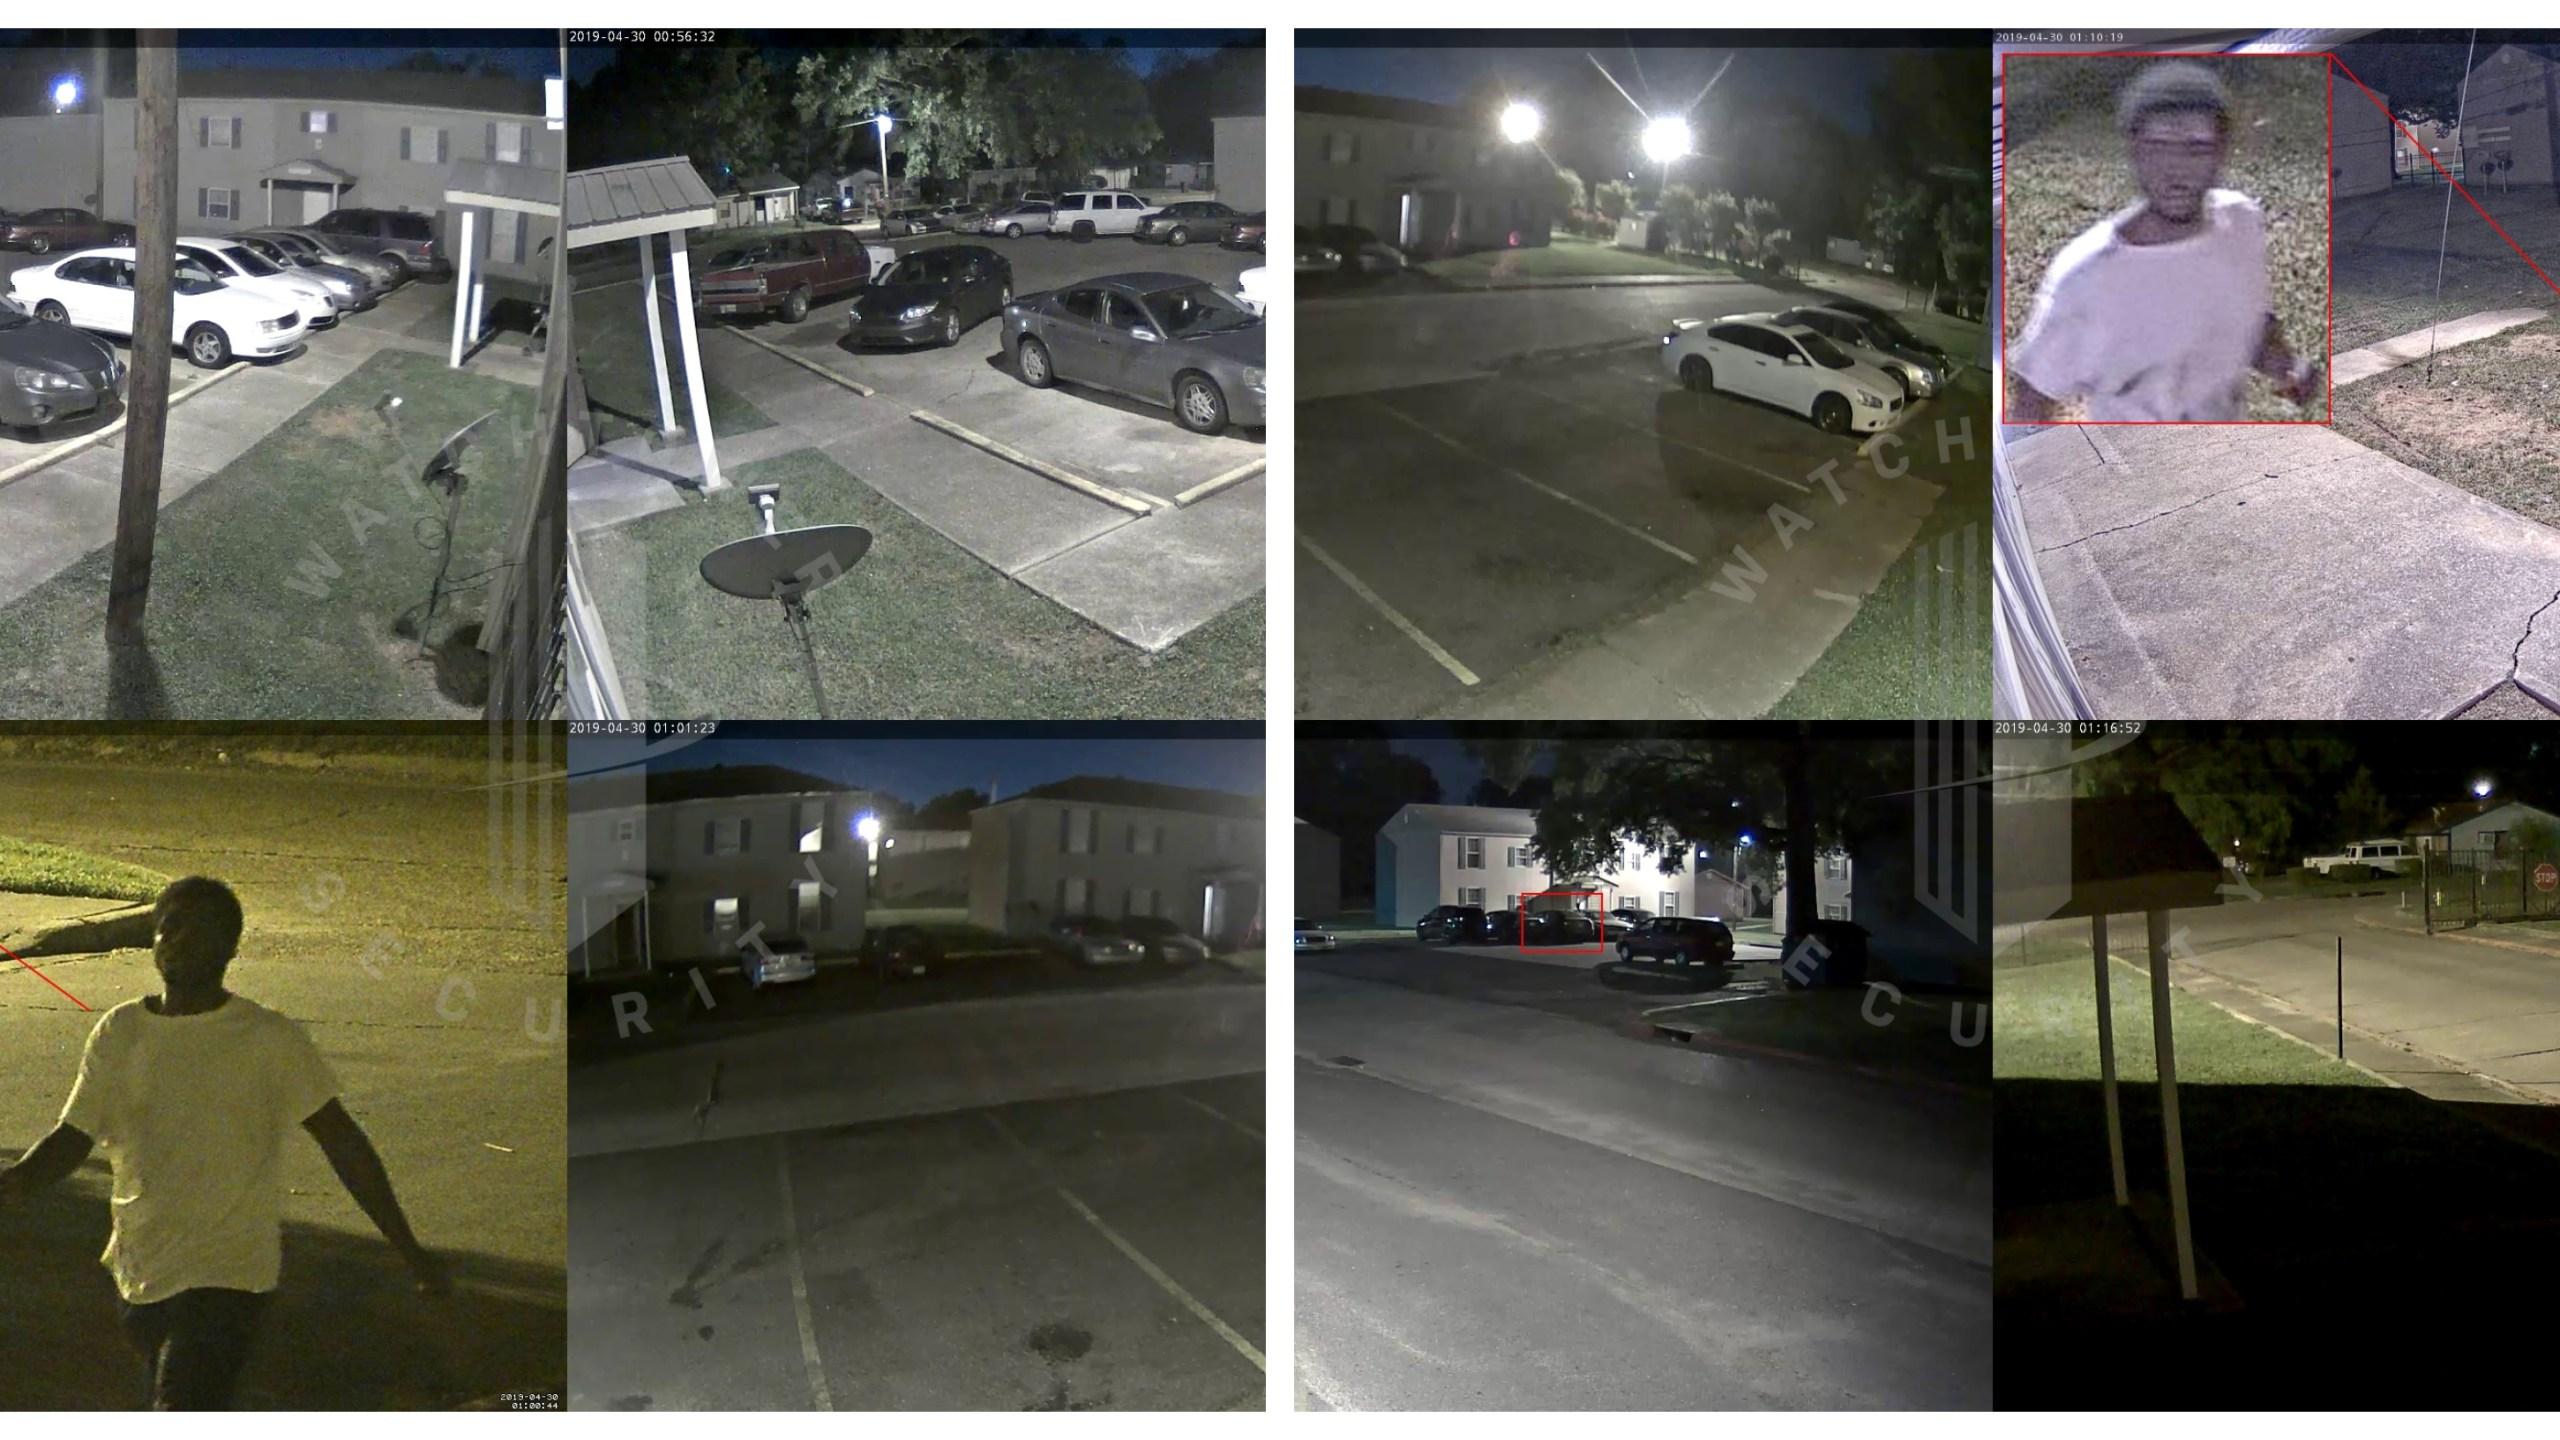 Attempted vehicle burglary suspect 05.21.19_1558450340982.jpg.jpg